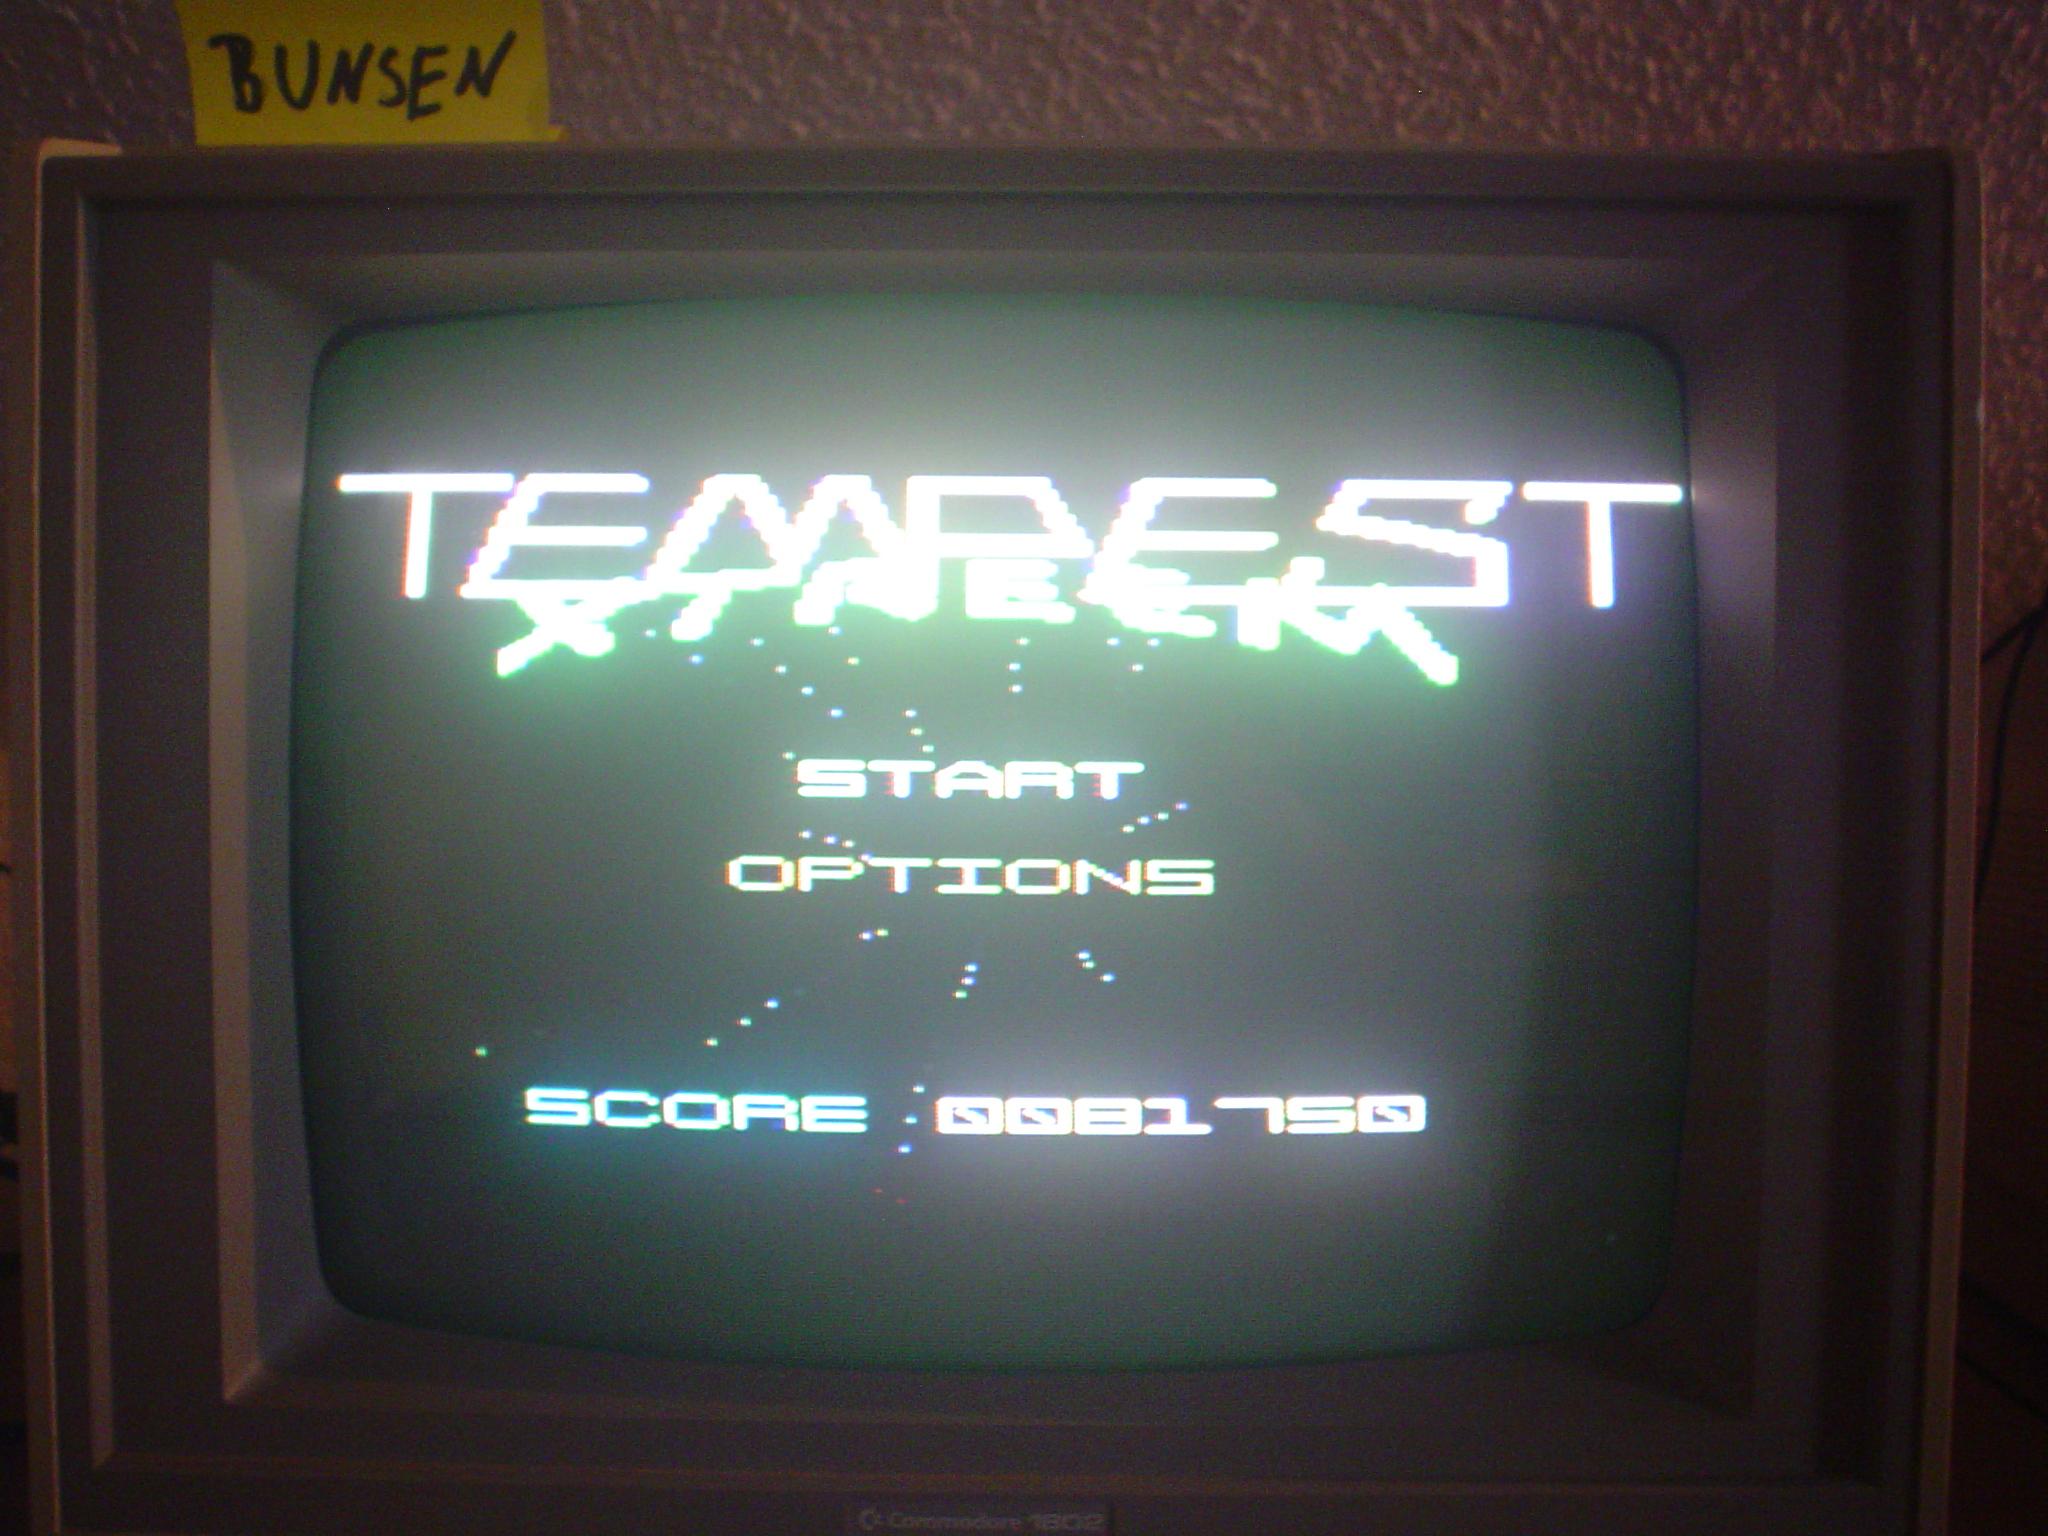 Tempest Xtreem 81,750 points